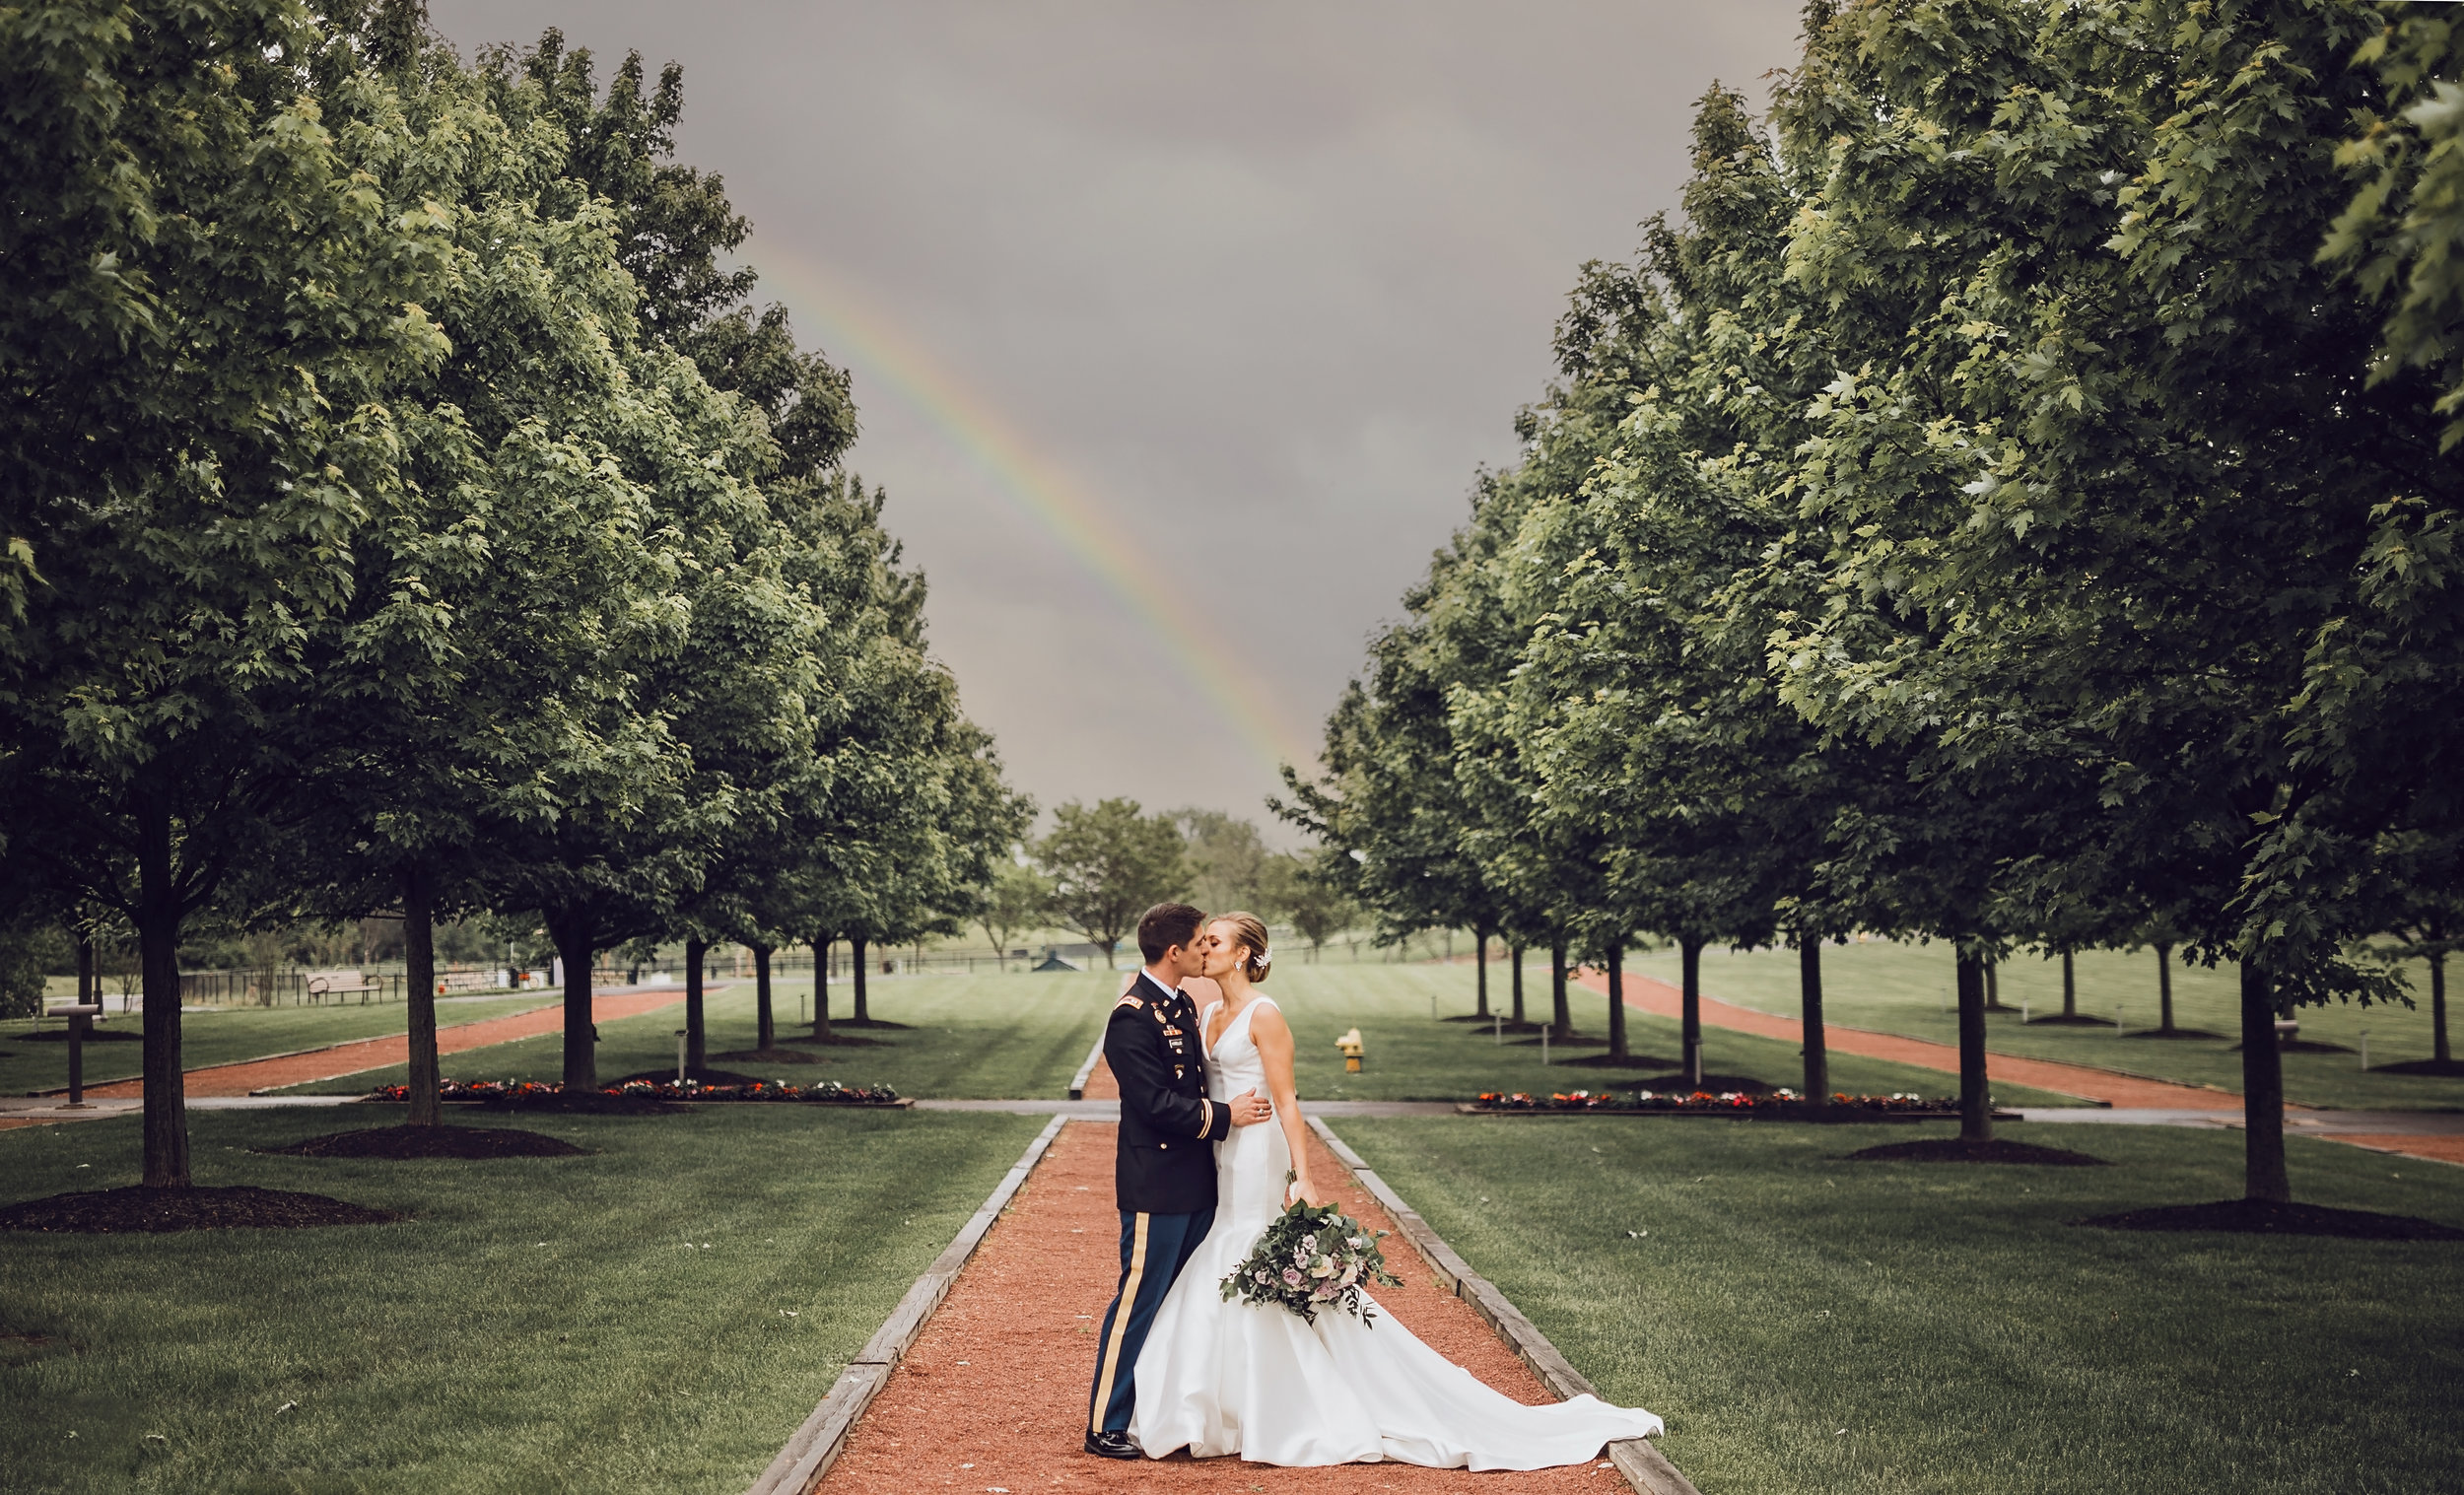 Centennial-Park-Munster-indiana-bride-and-groom-Lauren-ashley-studios-rainbow.jpg